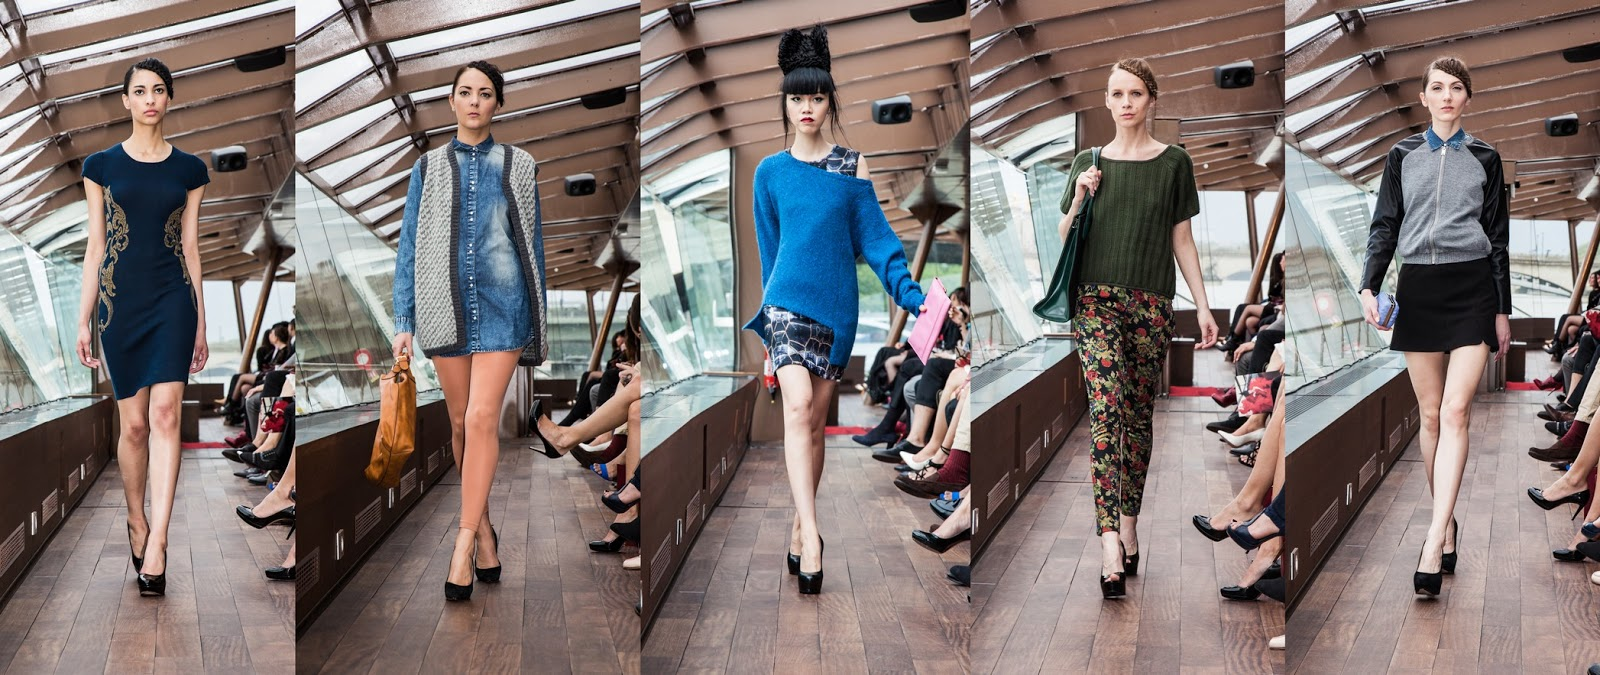 WTFSG-j-summer-fashion-show-on-river-seine-paris-9